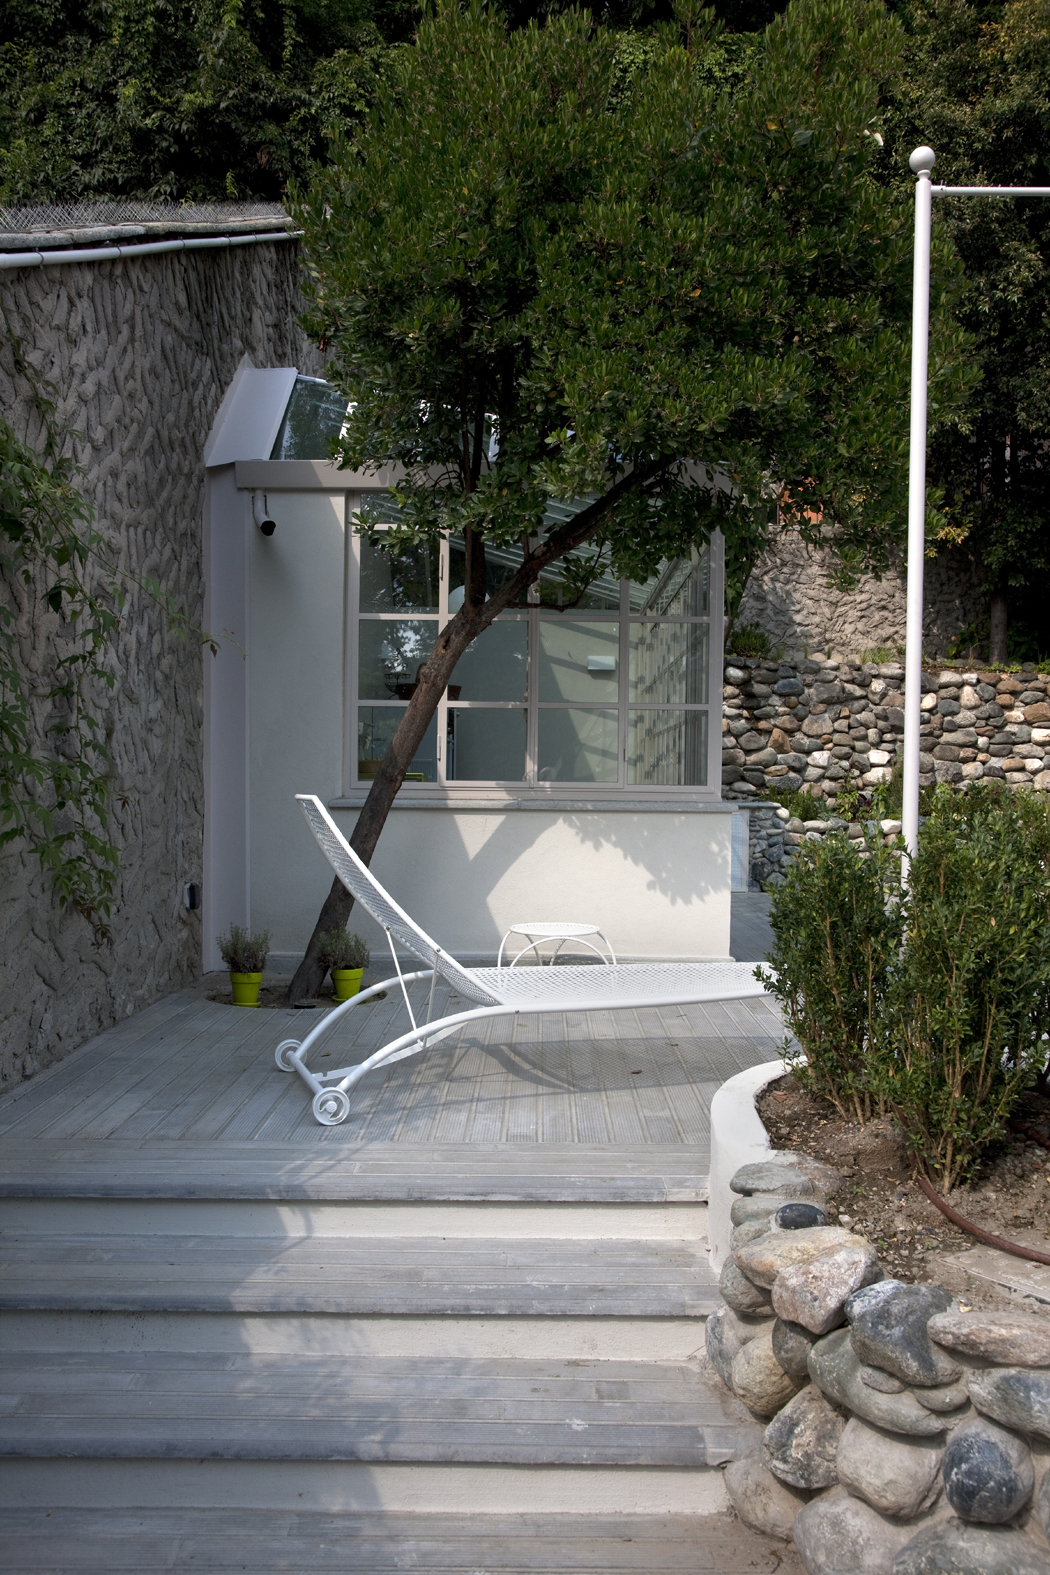 Serra cucina in giardino classico giardino segreto - Cucina giardino ...